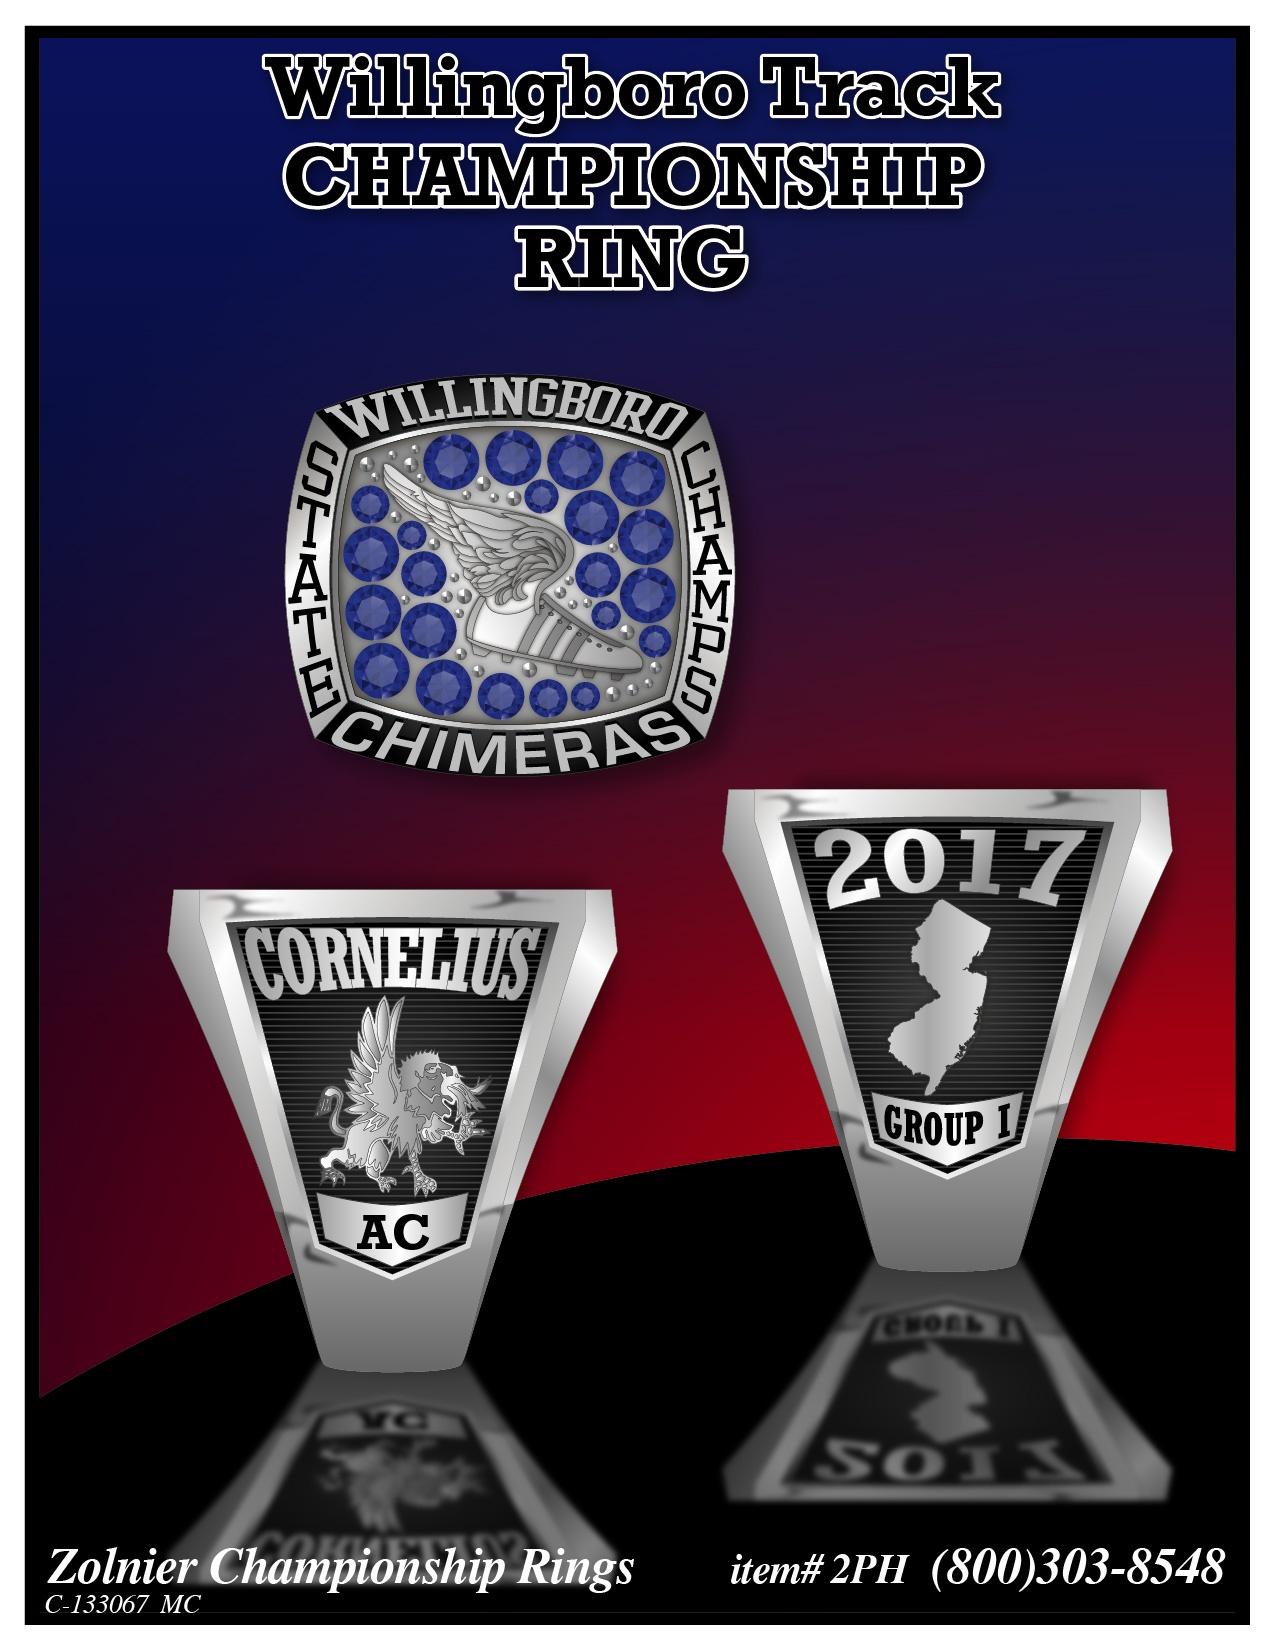 C-133067-2 Willingboro Track Championship Ring